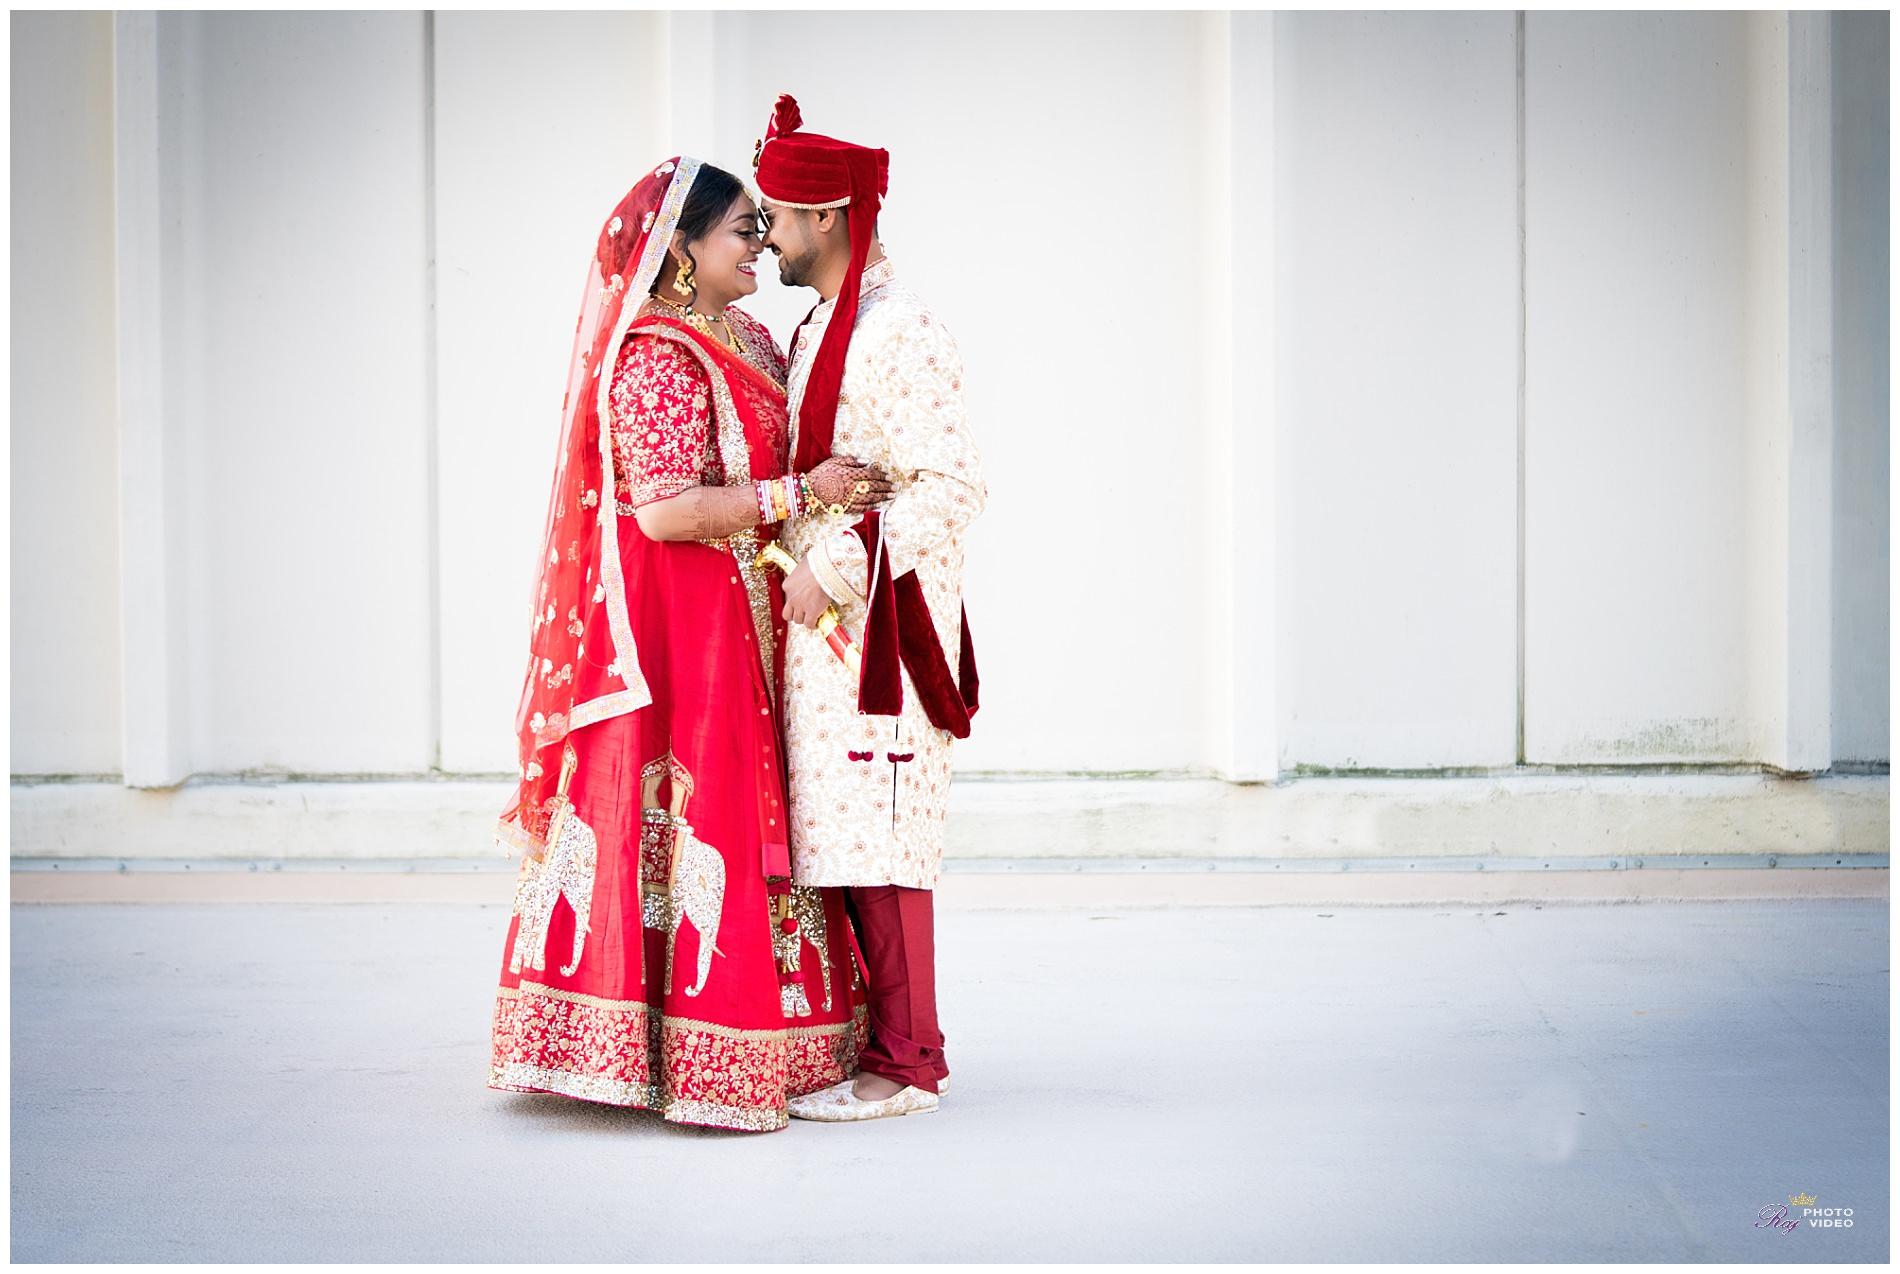 doubletree-by-hilton-hotel-wilmington-de-wedding-krishna-ritesh-29.jpg